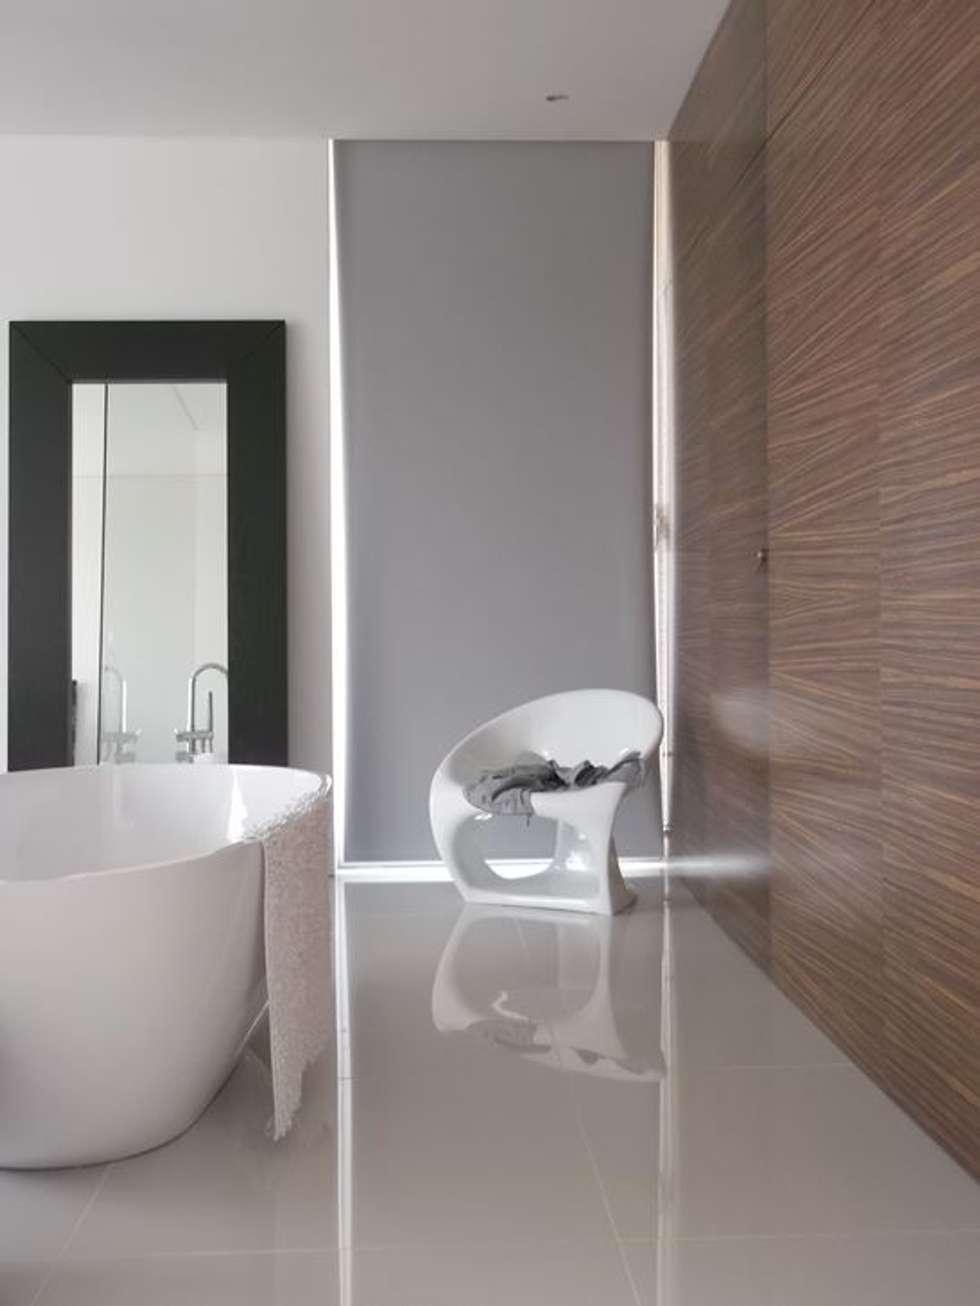 Casa Claudia: Casas de banho minimalistas por Artspazios, arquitectos e designers